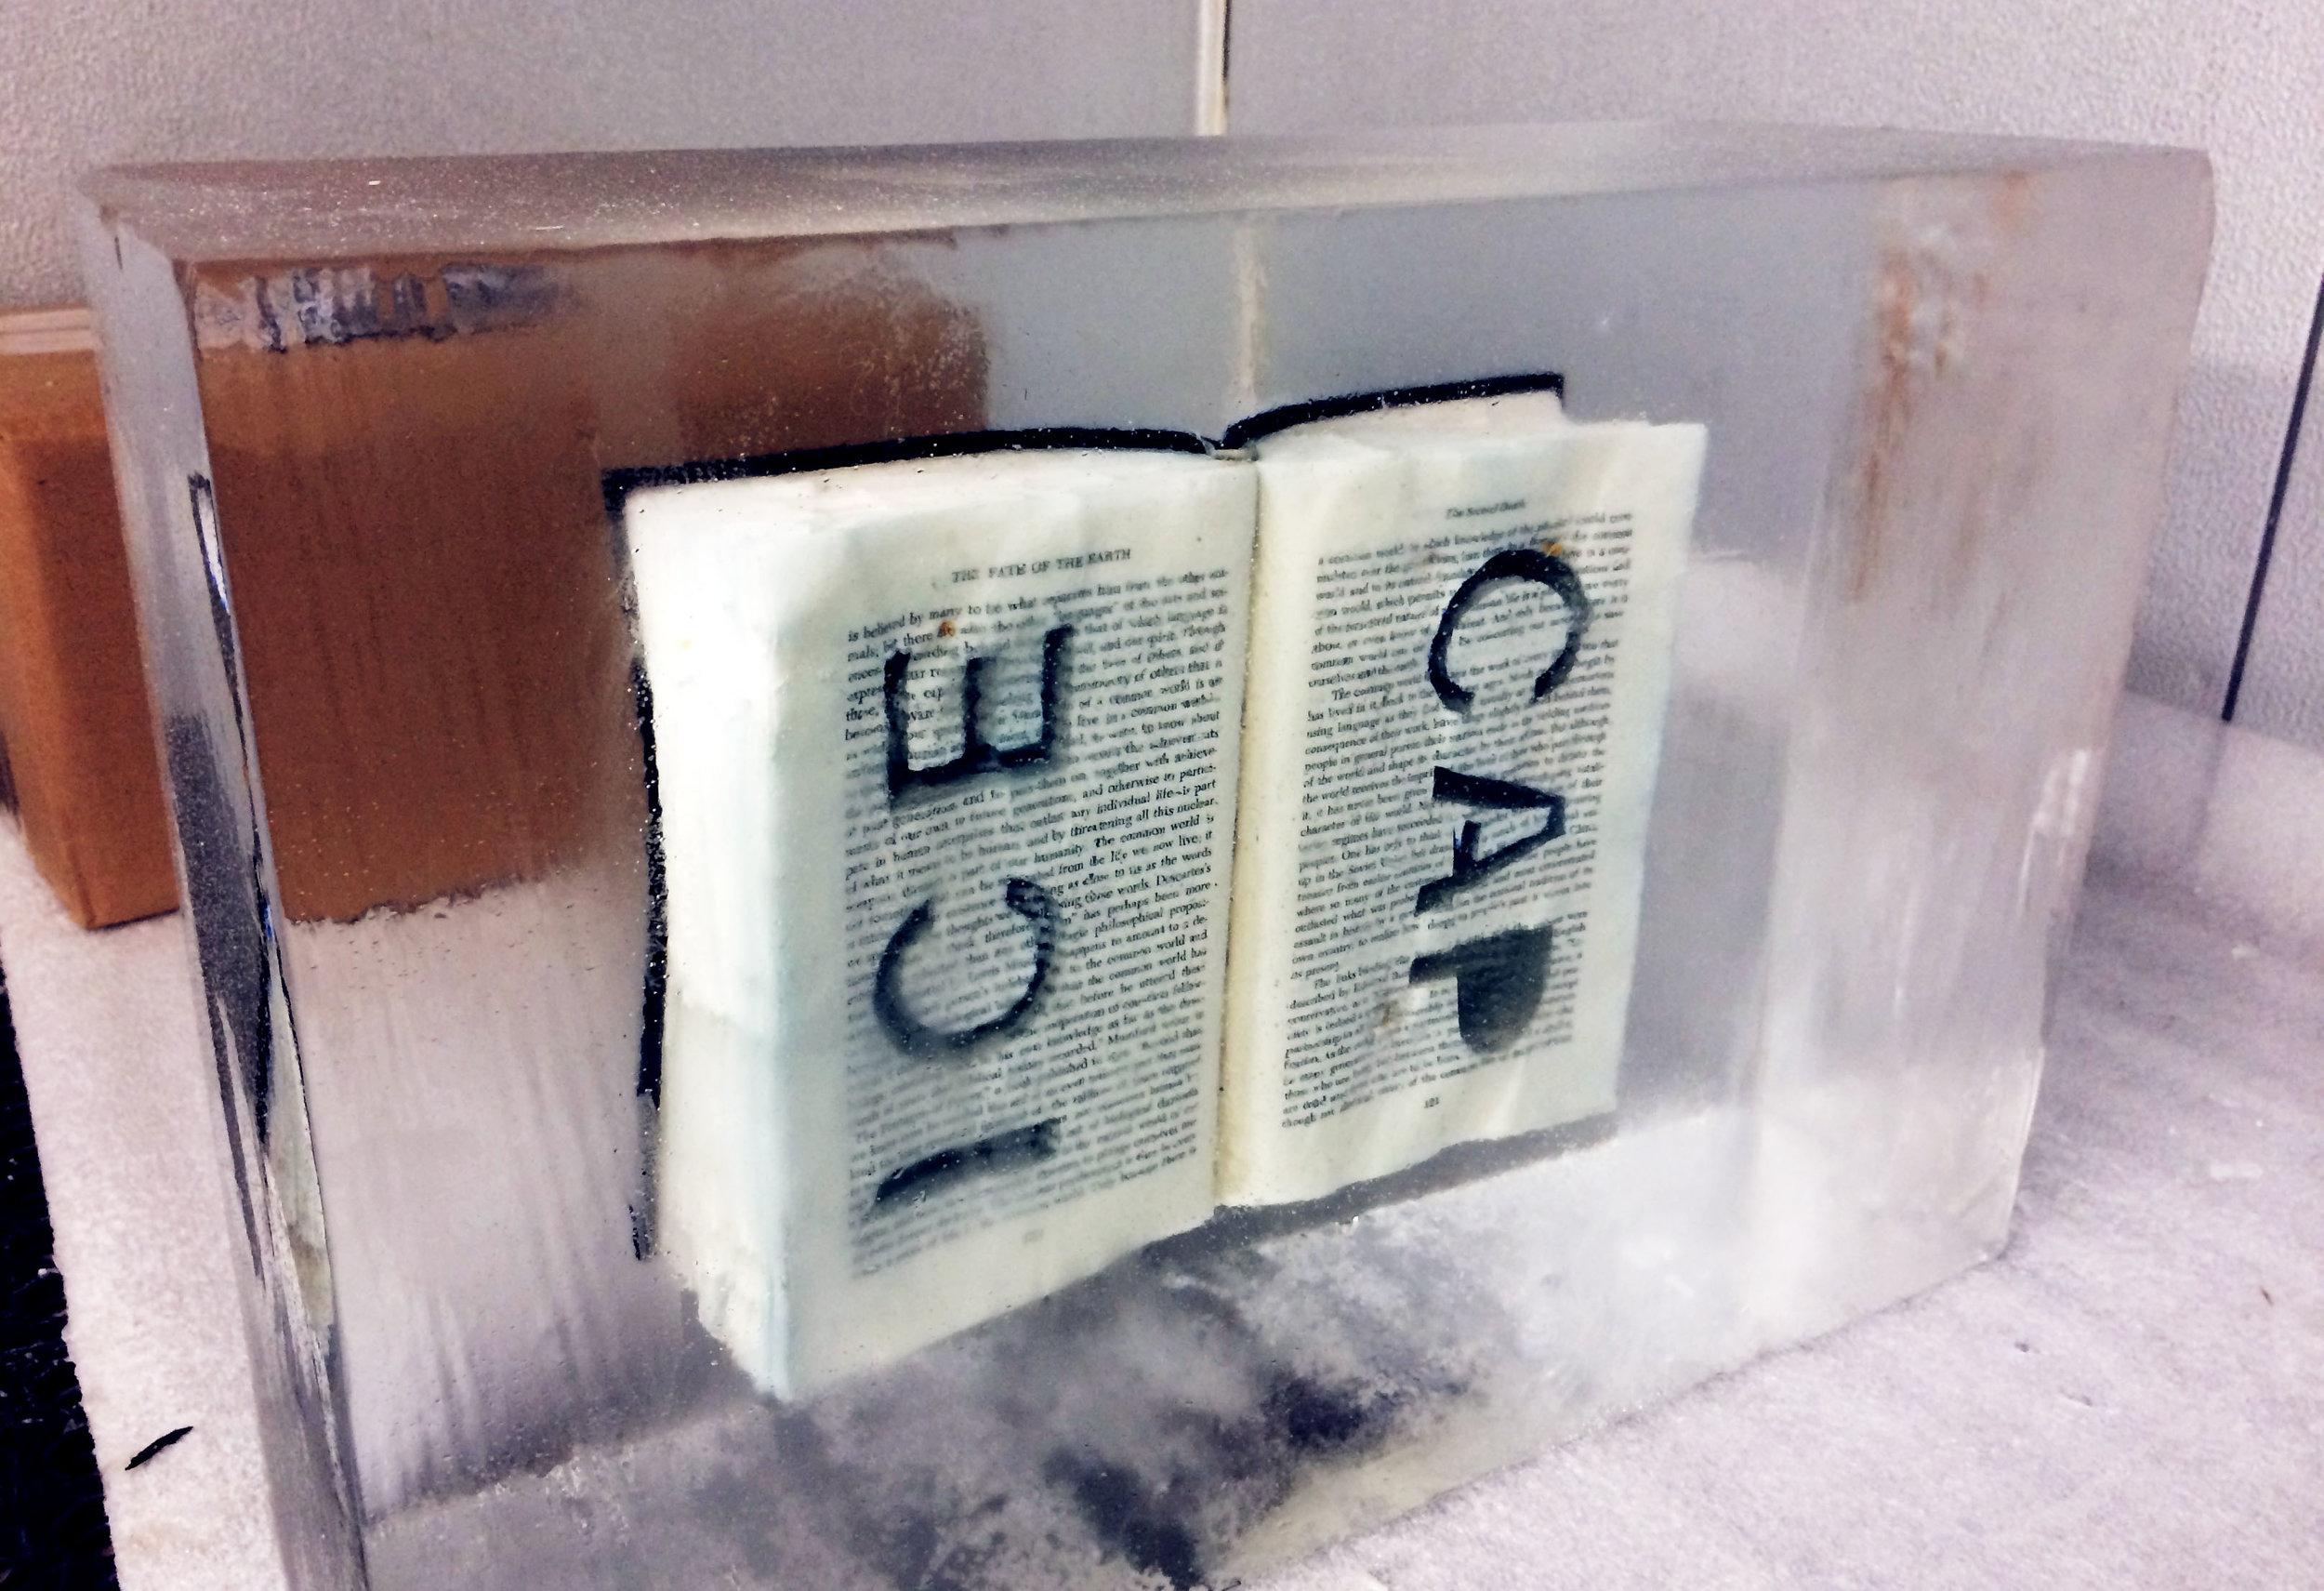 book frozen for doug beube*.jpg